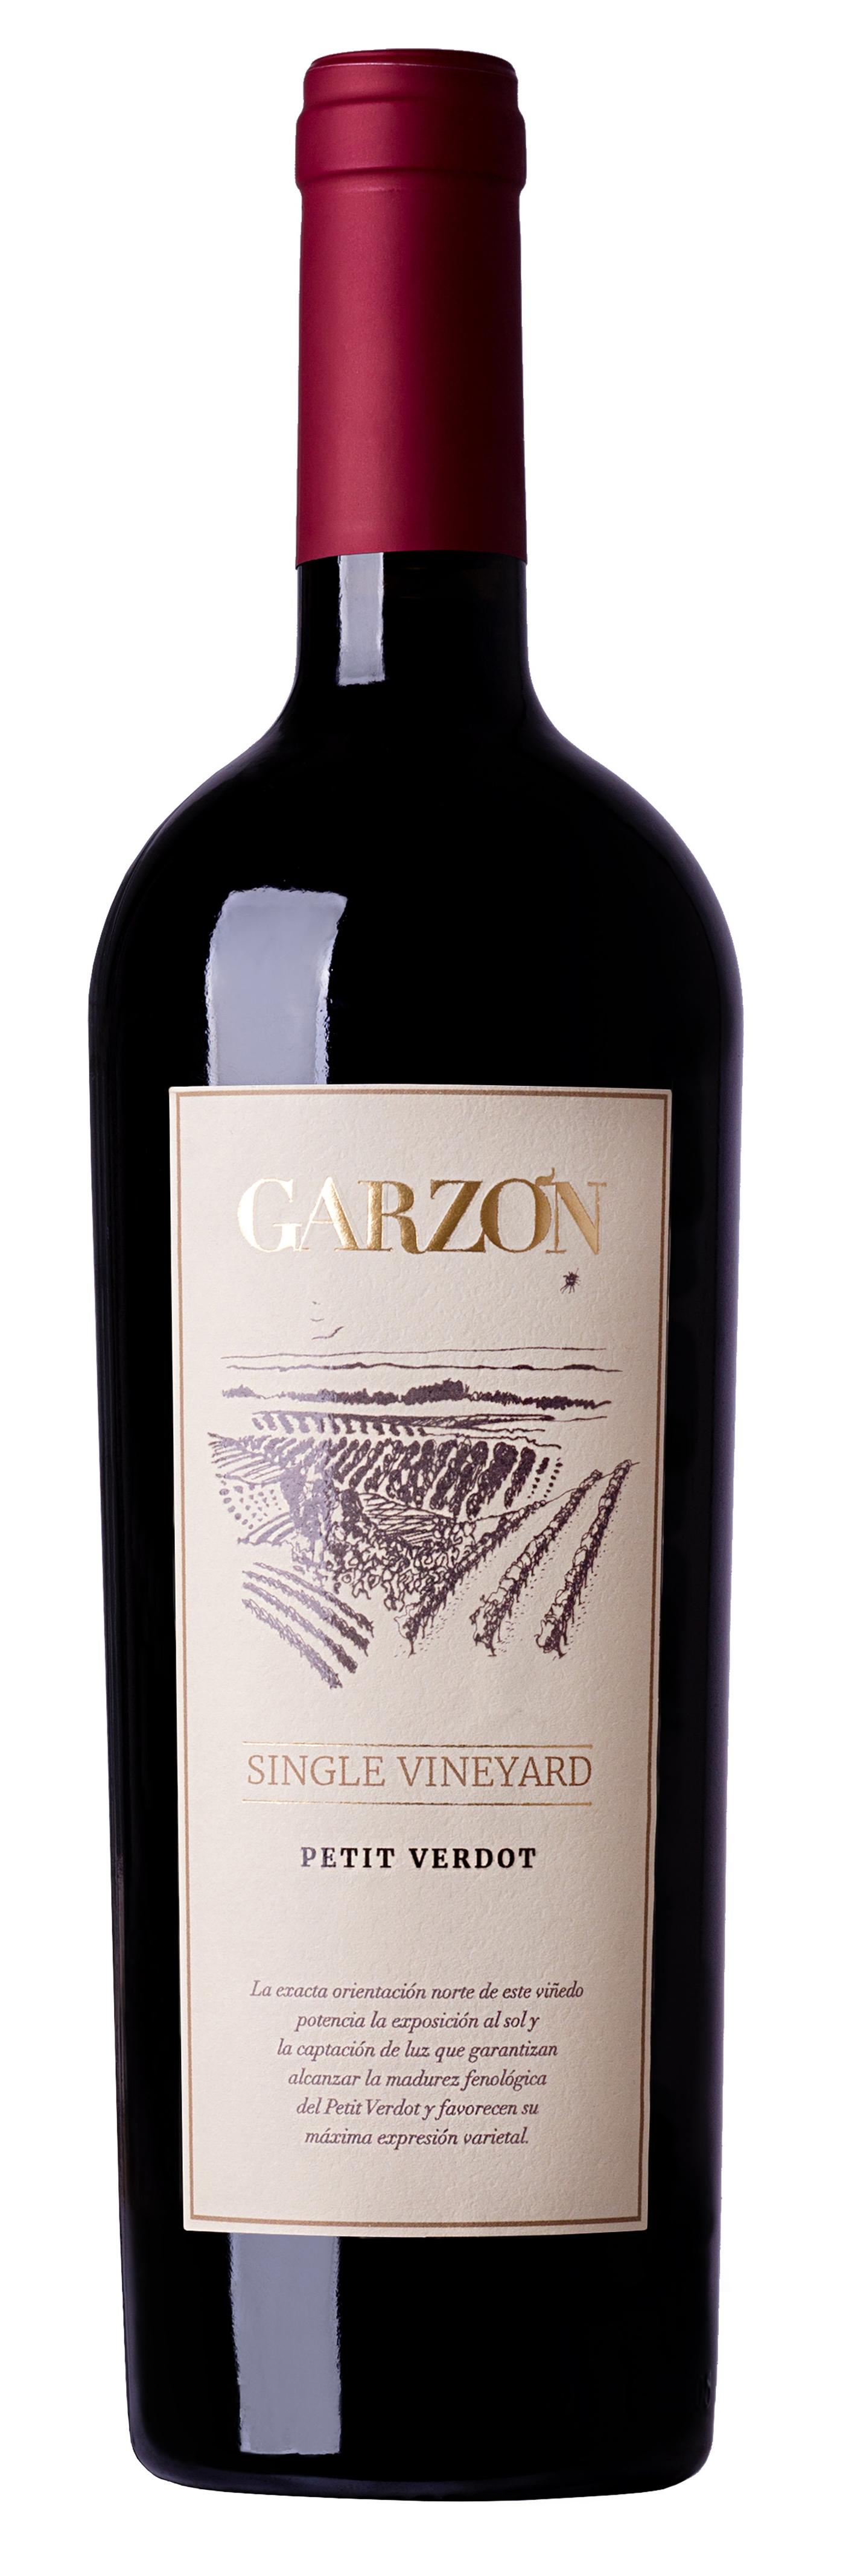 Bodega Garzón Single Vineyard, Petit Verdot 2017